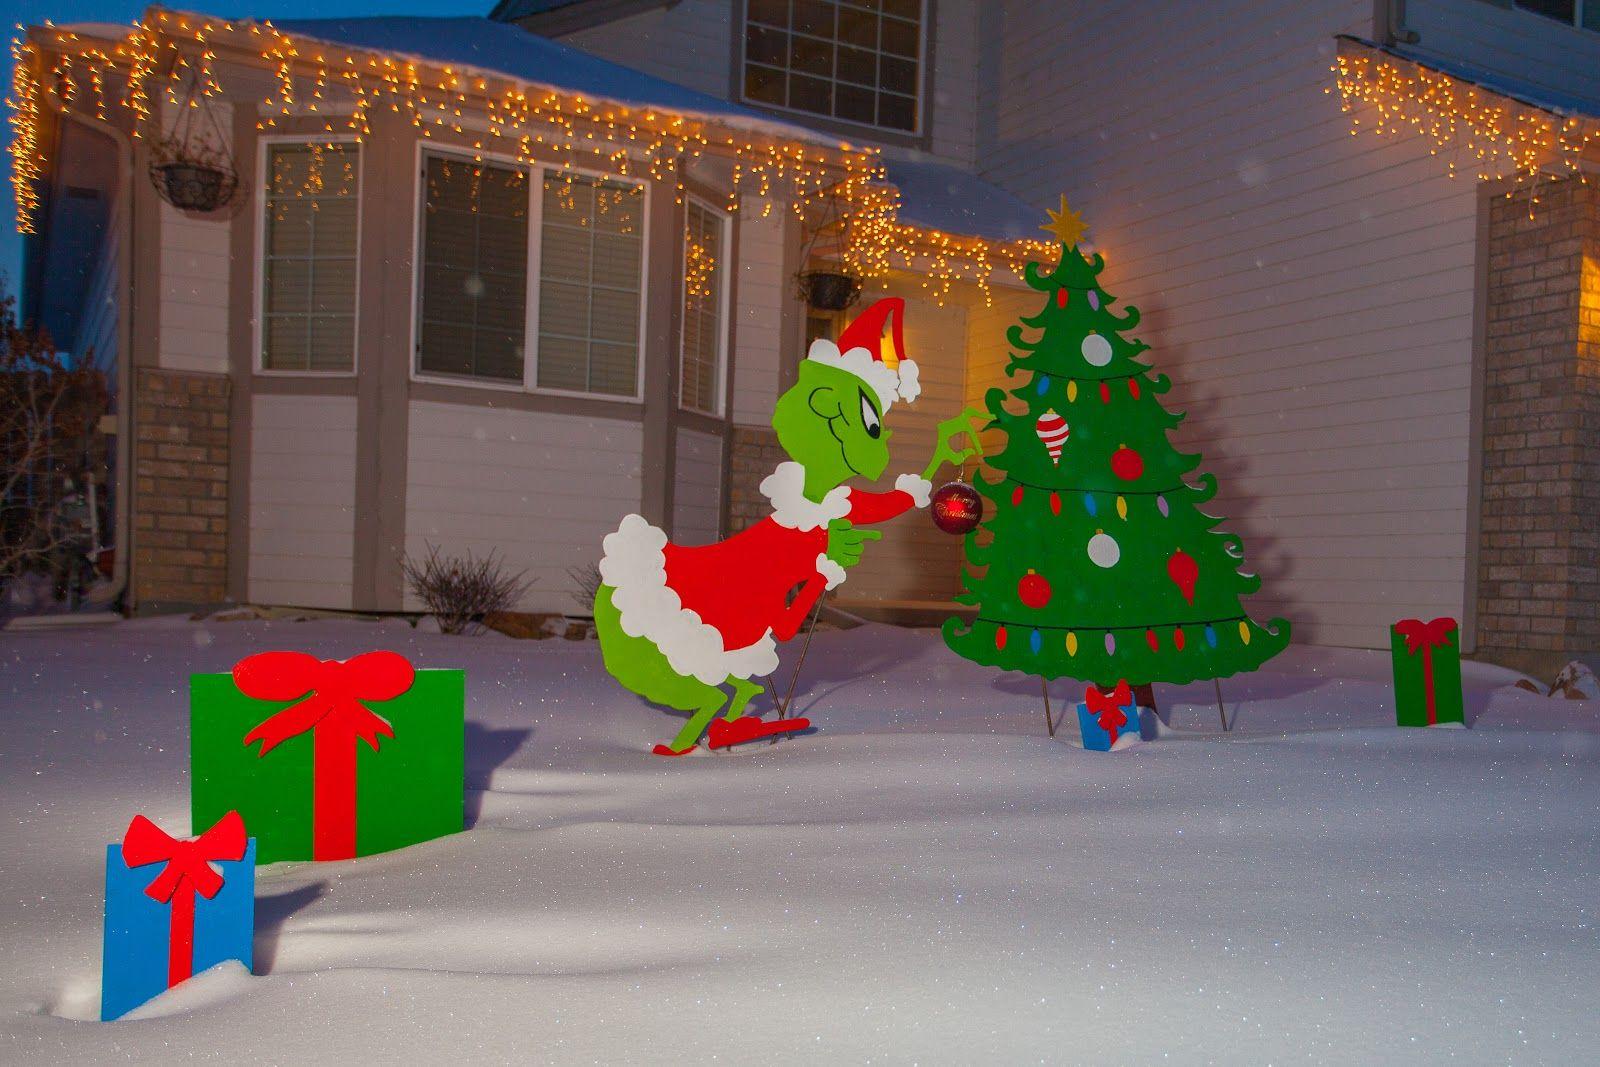 Diy Christmas Yard Decorations Diy Projects Christmas Yard Decorations Grinch Christmas Decorations Christmas Yard Christmas Yard Decorations